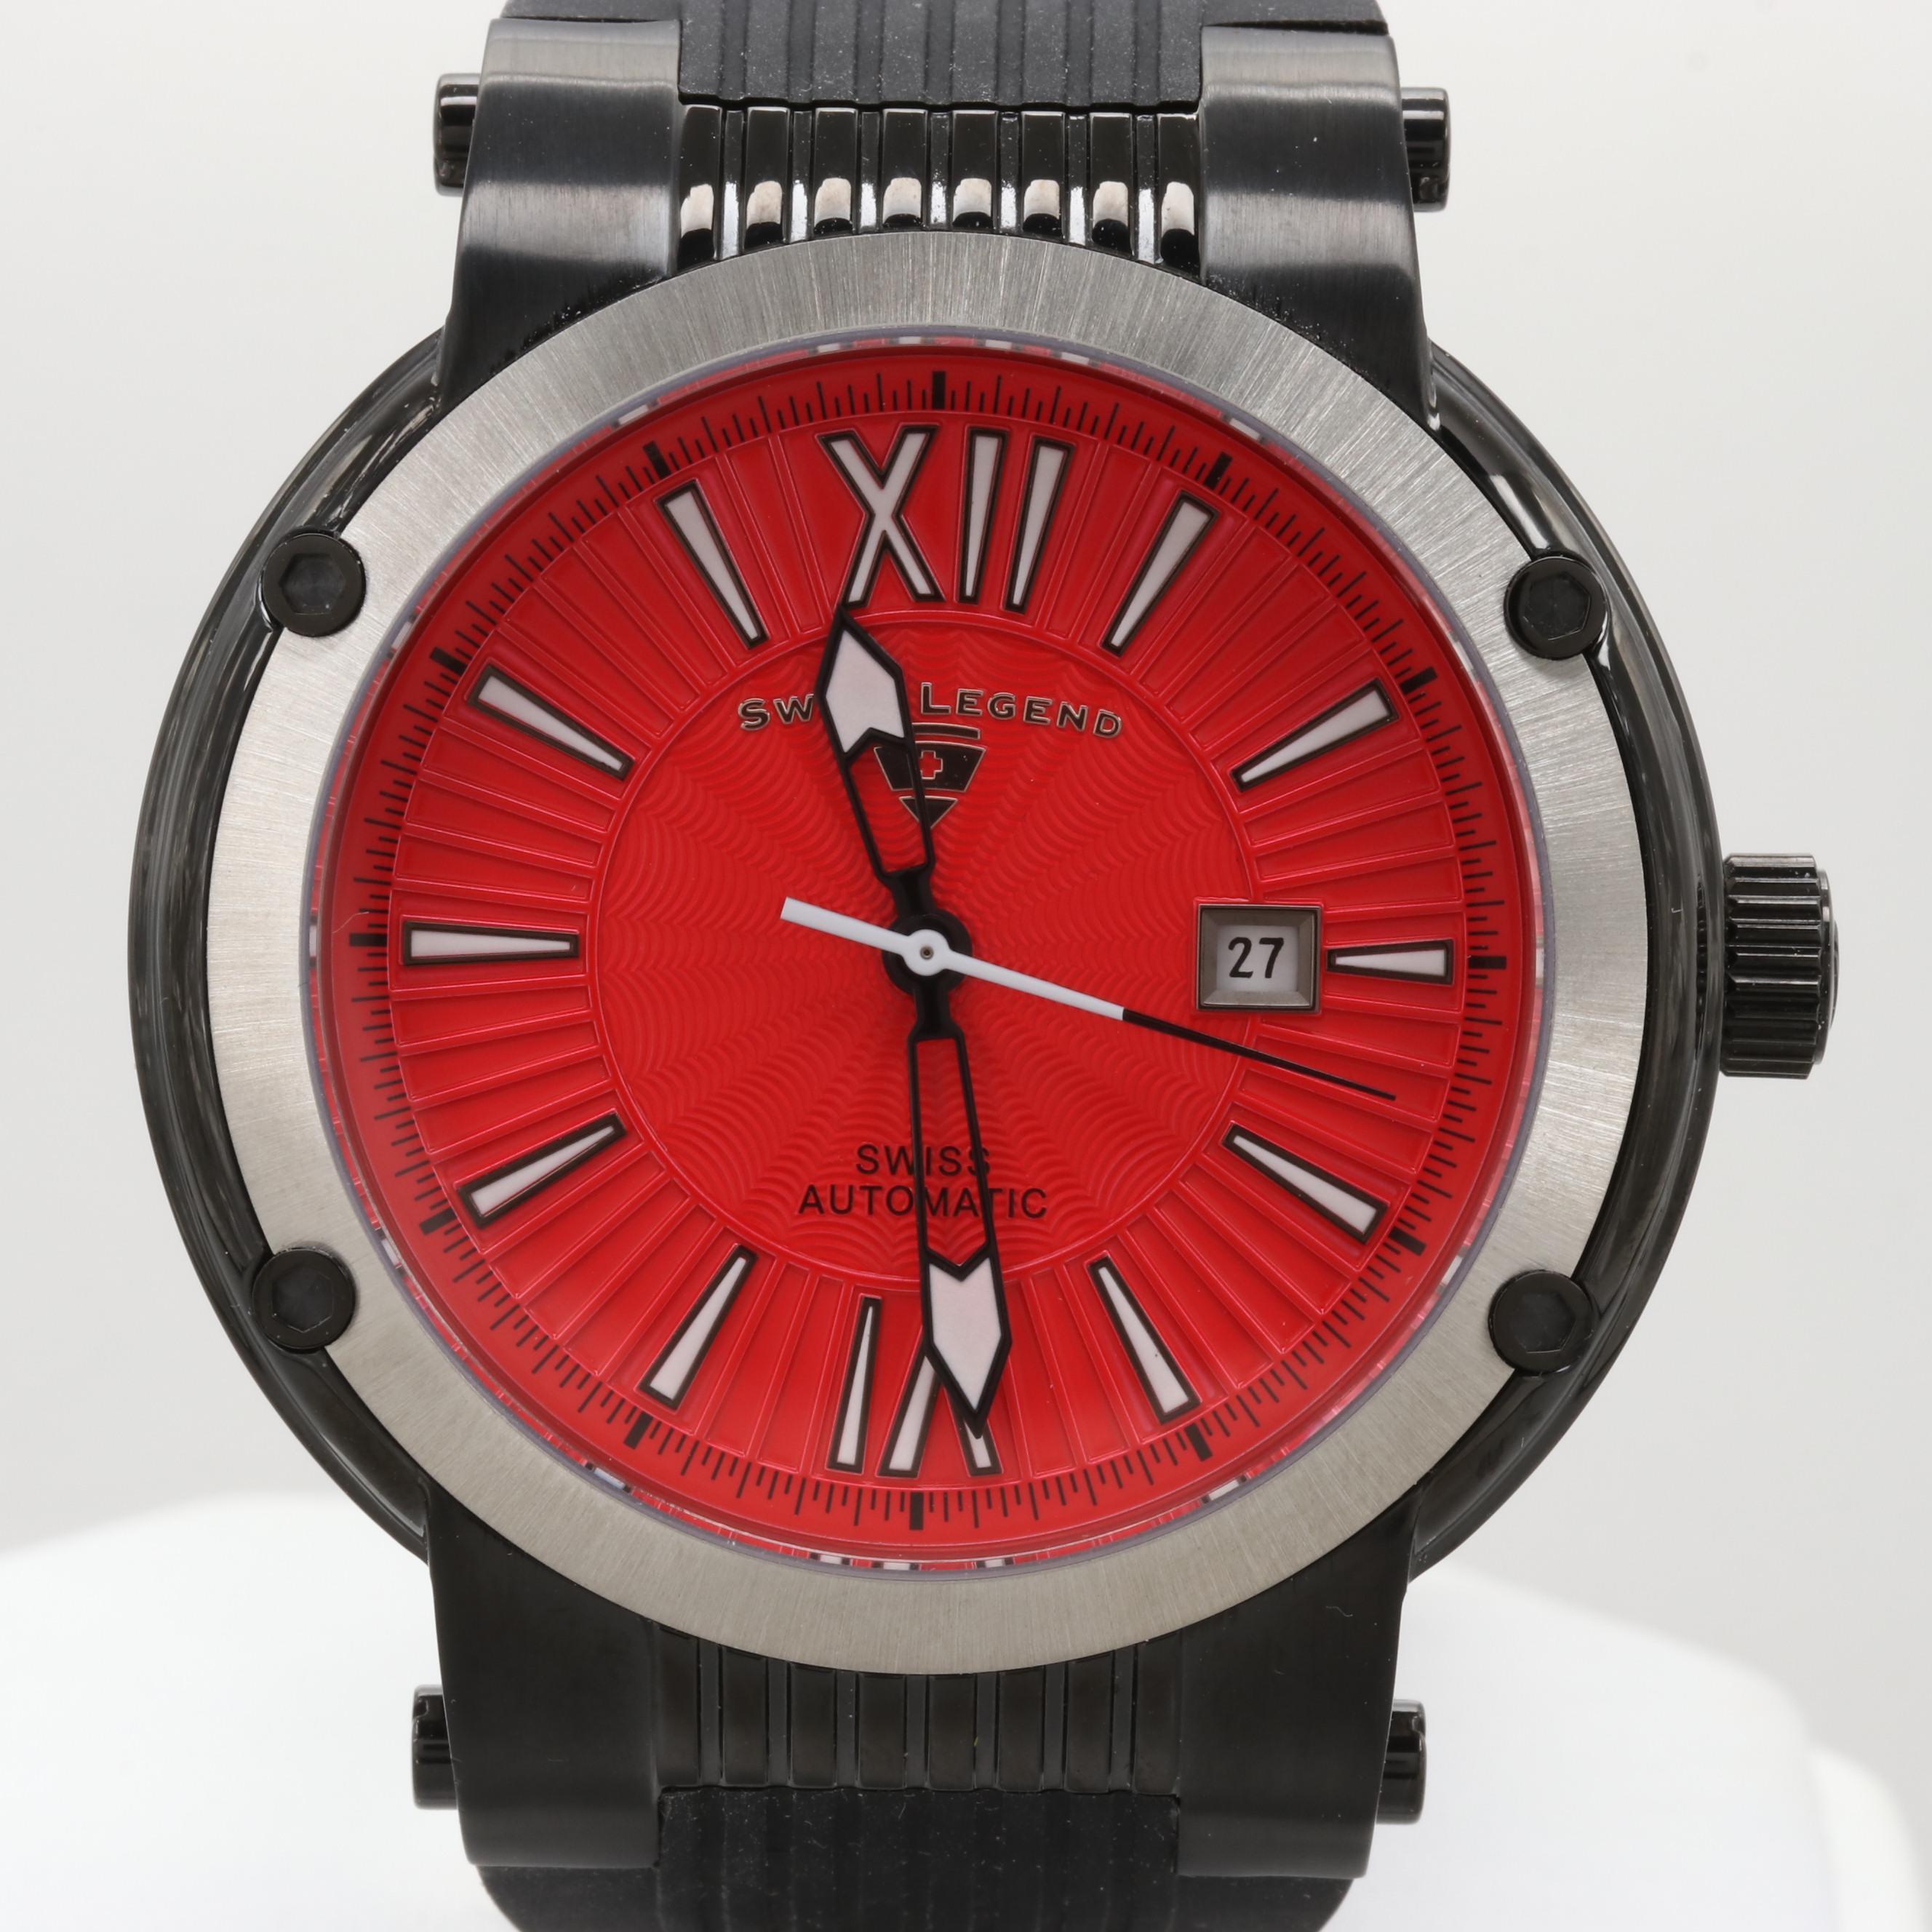 Swiss Legend Legato Cirque Automatic Wristwatch With Watch Winder